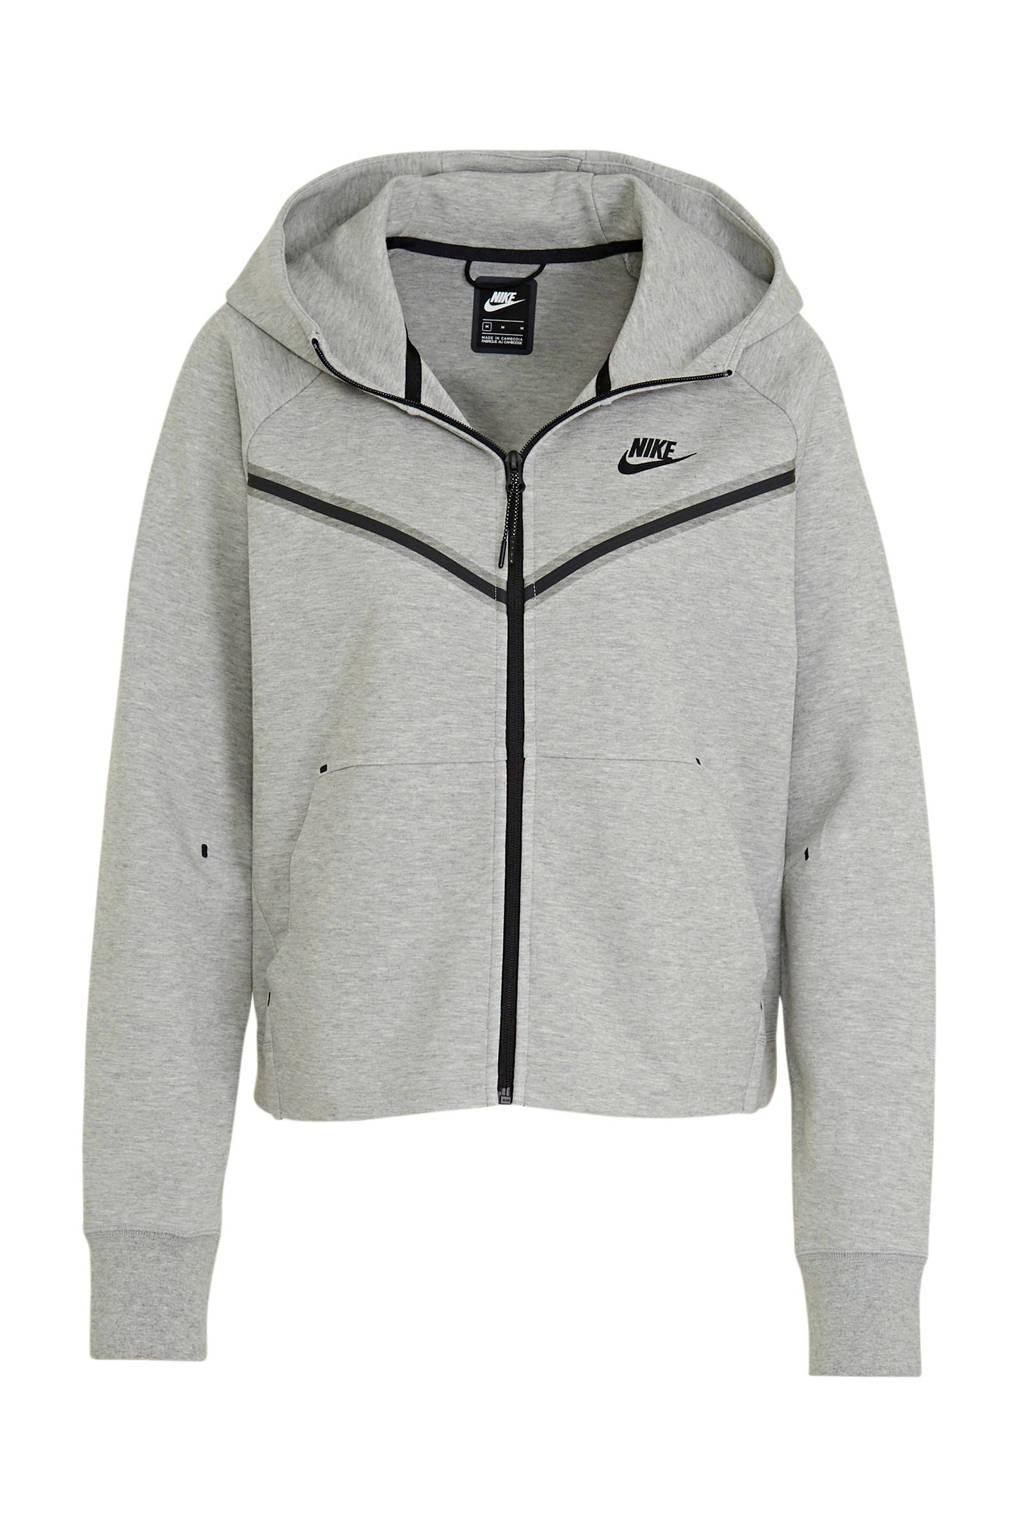 Nike sweatvest grijs, Grijs